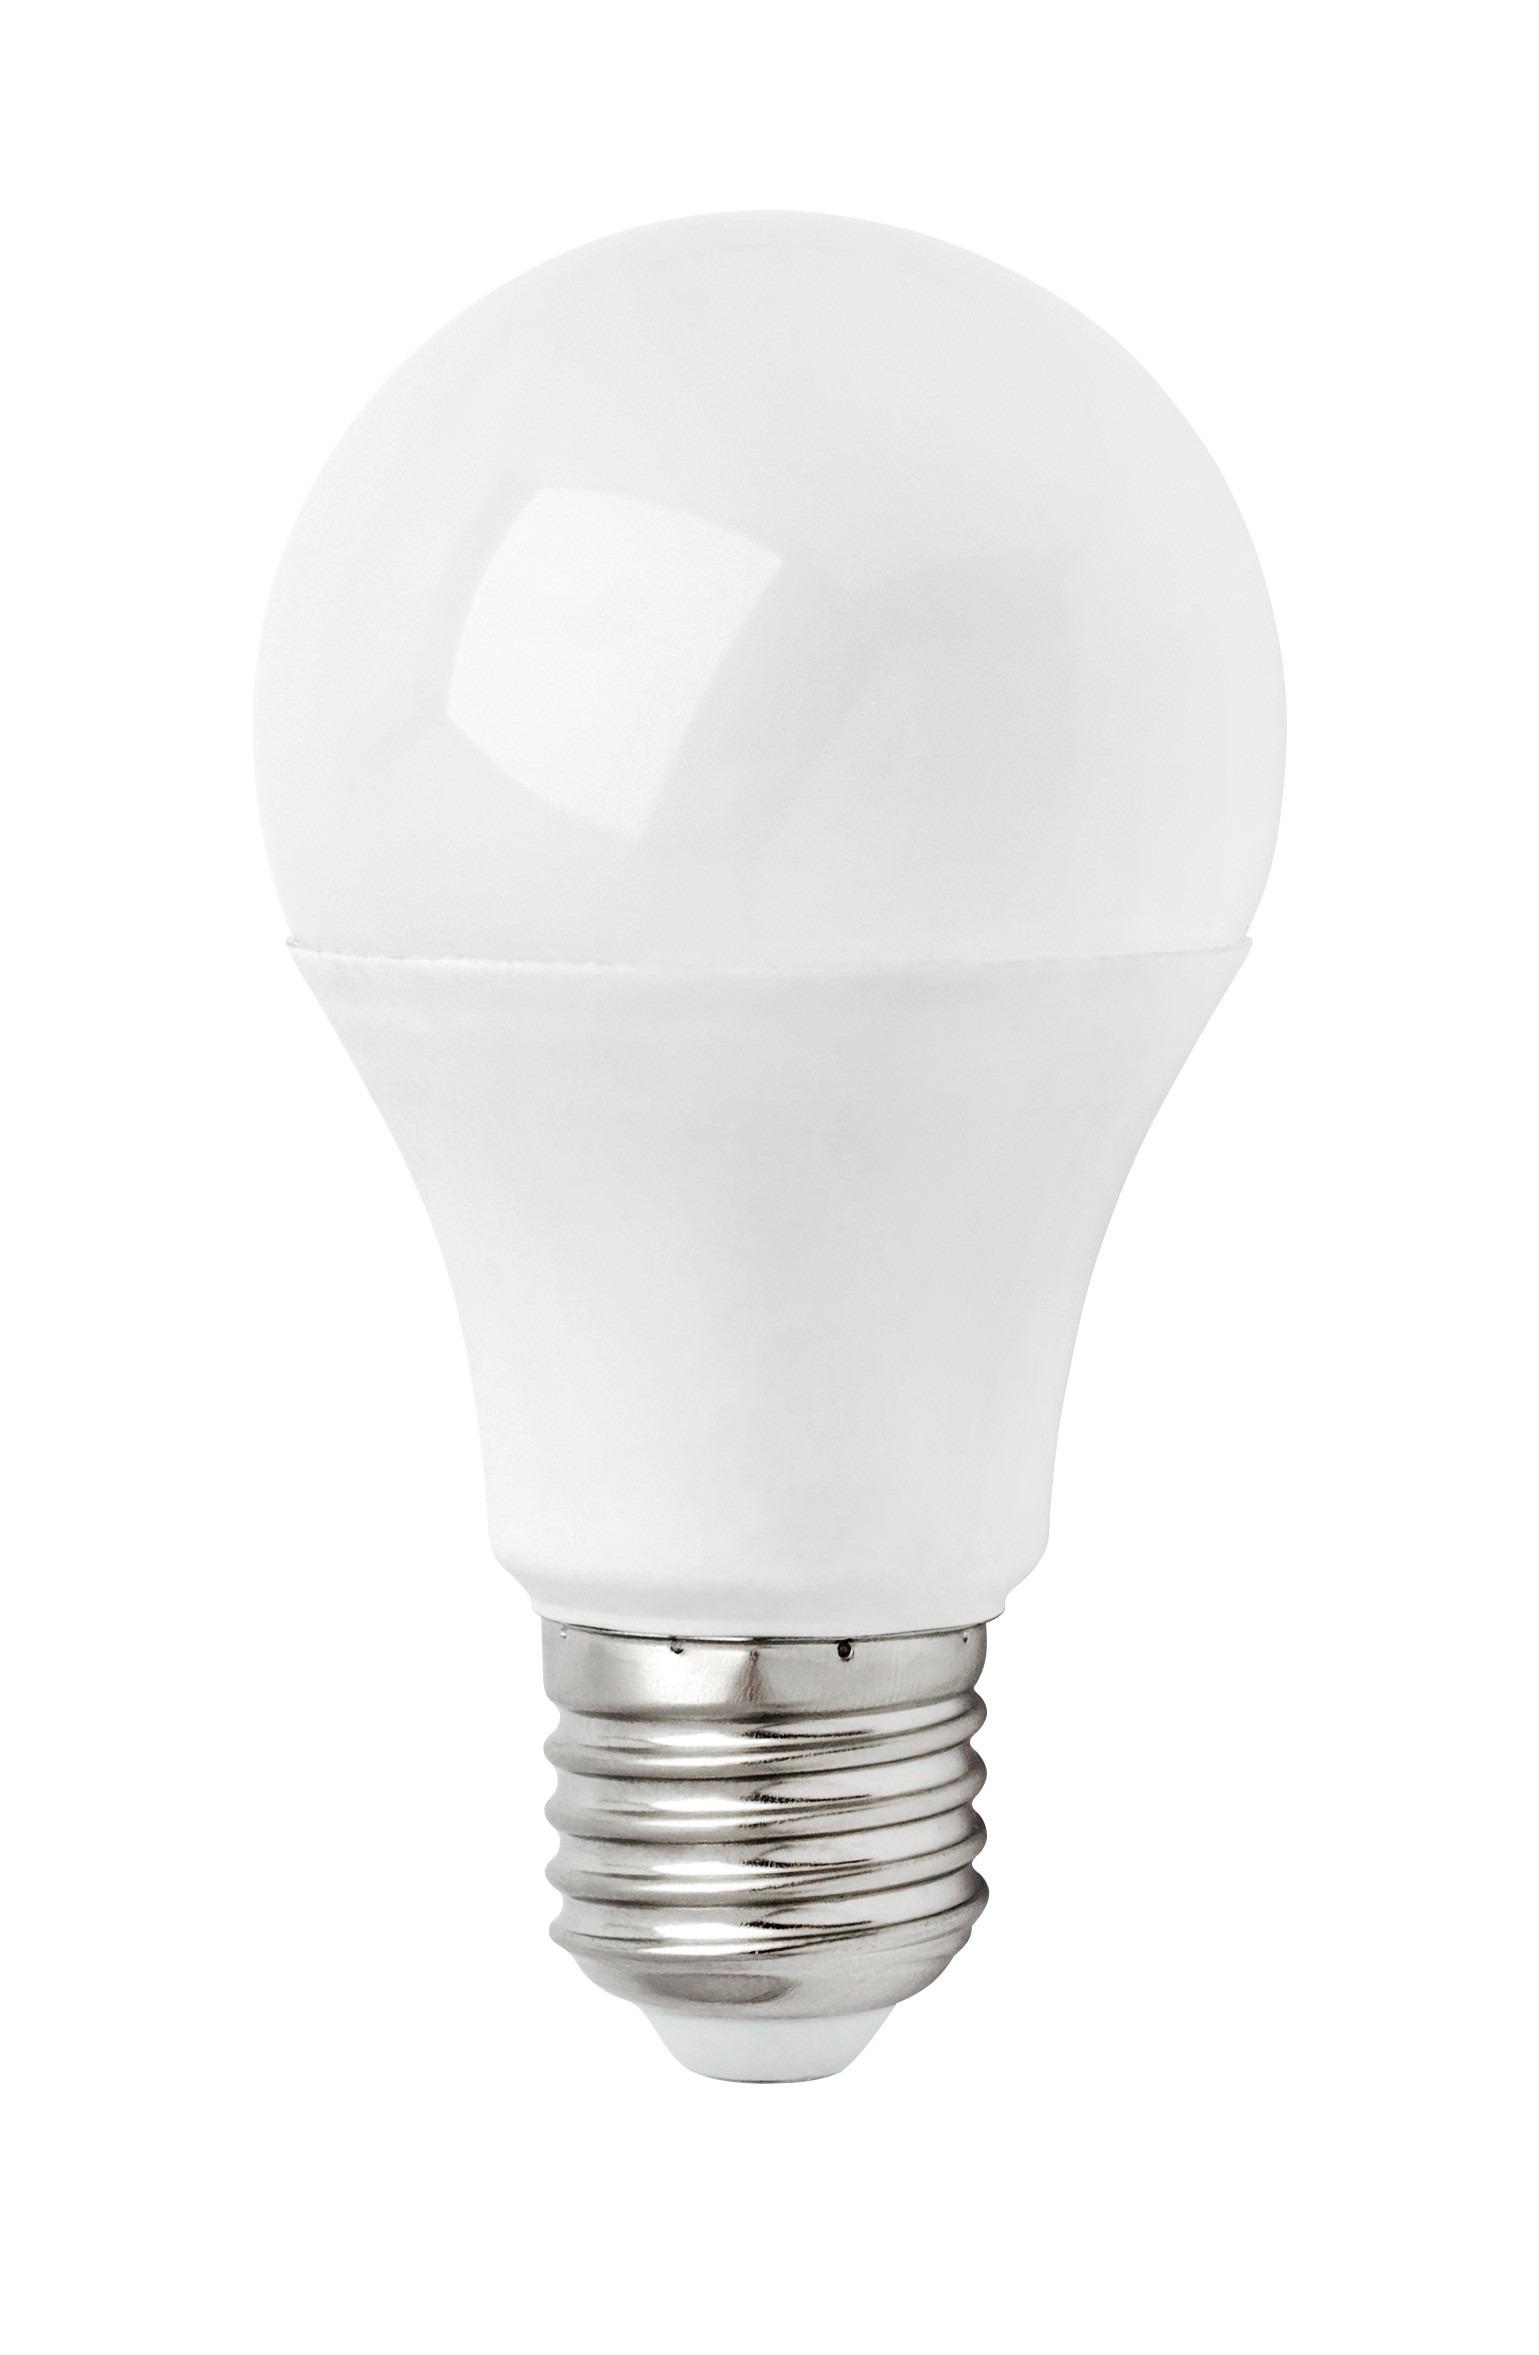 LED Birne 4 Watt 320 Lumen 270° Abstrahlwinkel-5.500 - 6.500 K kaltweiß